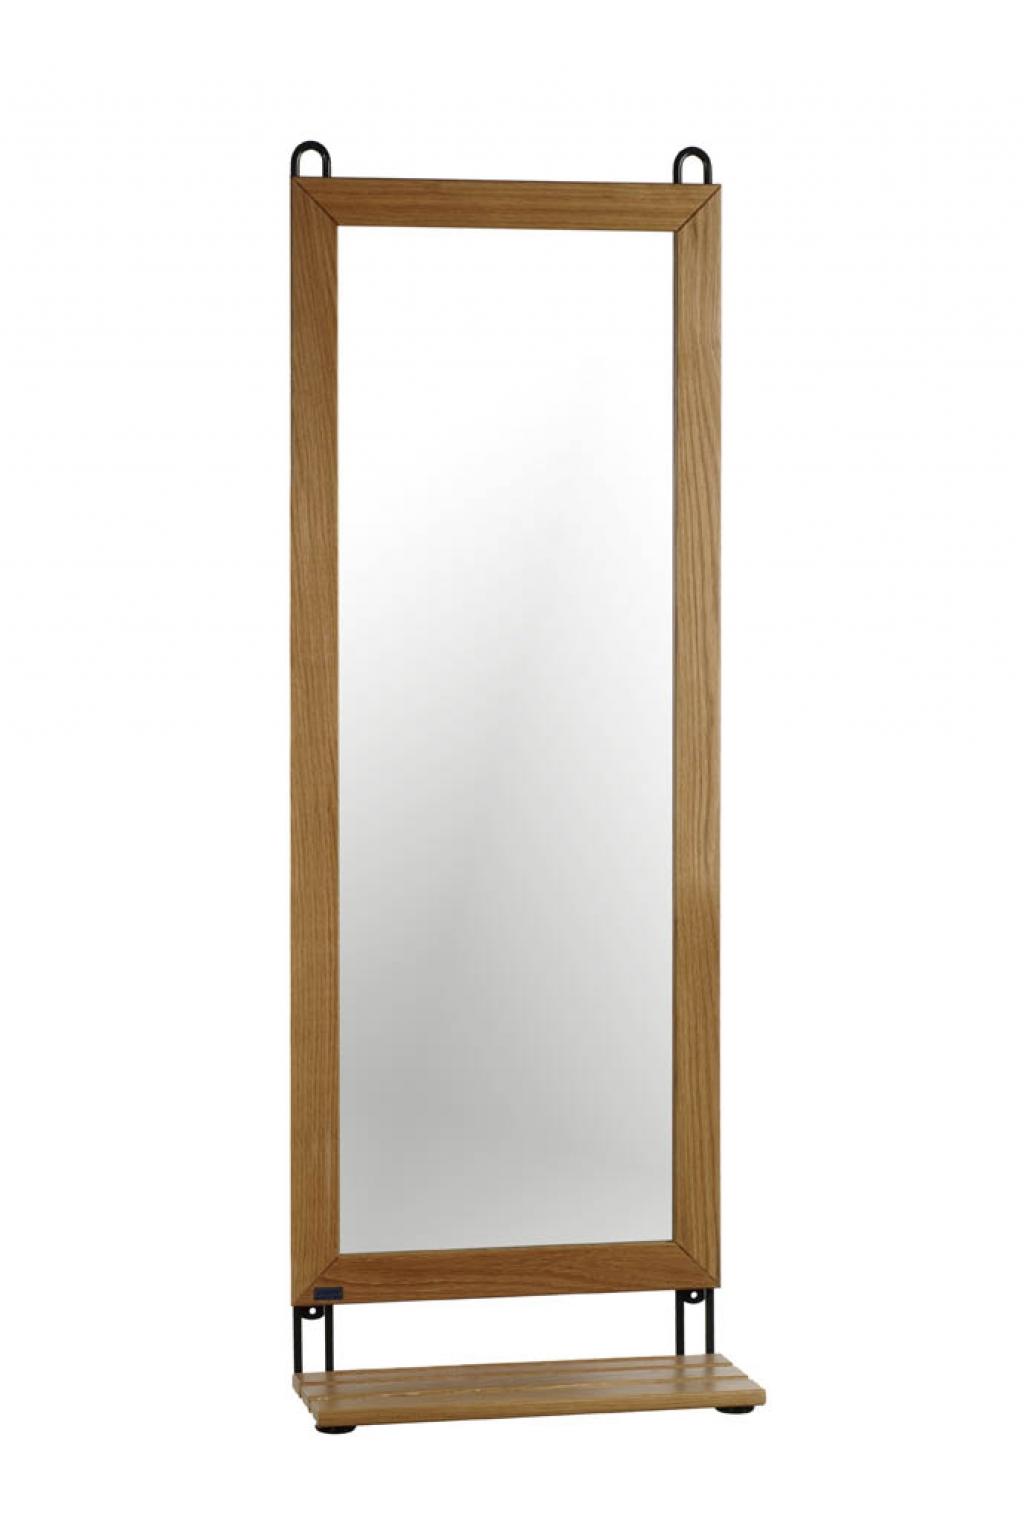 Spegel_ek/svart